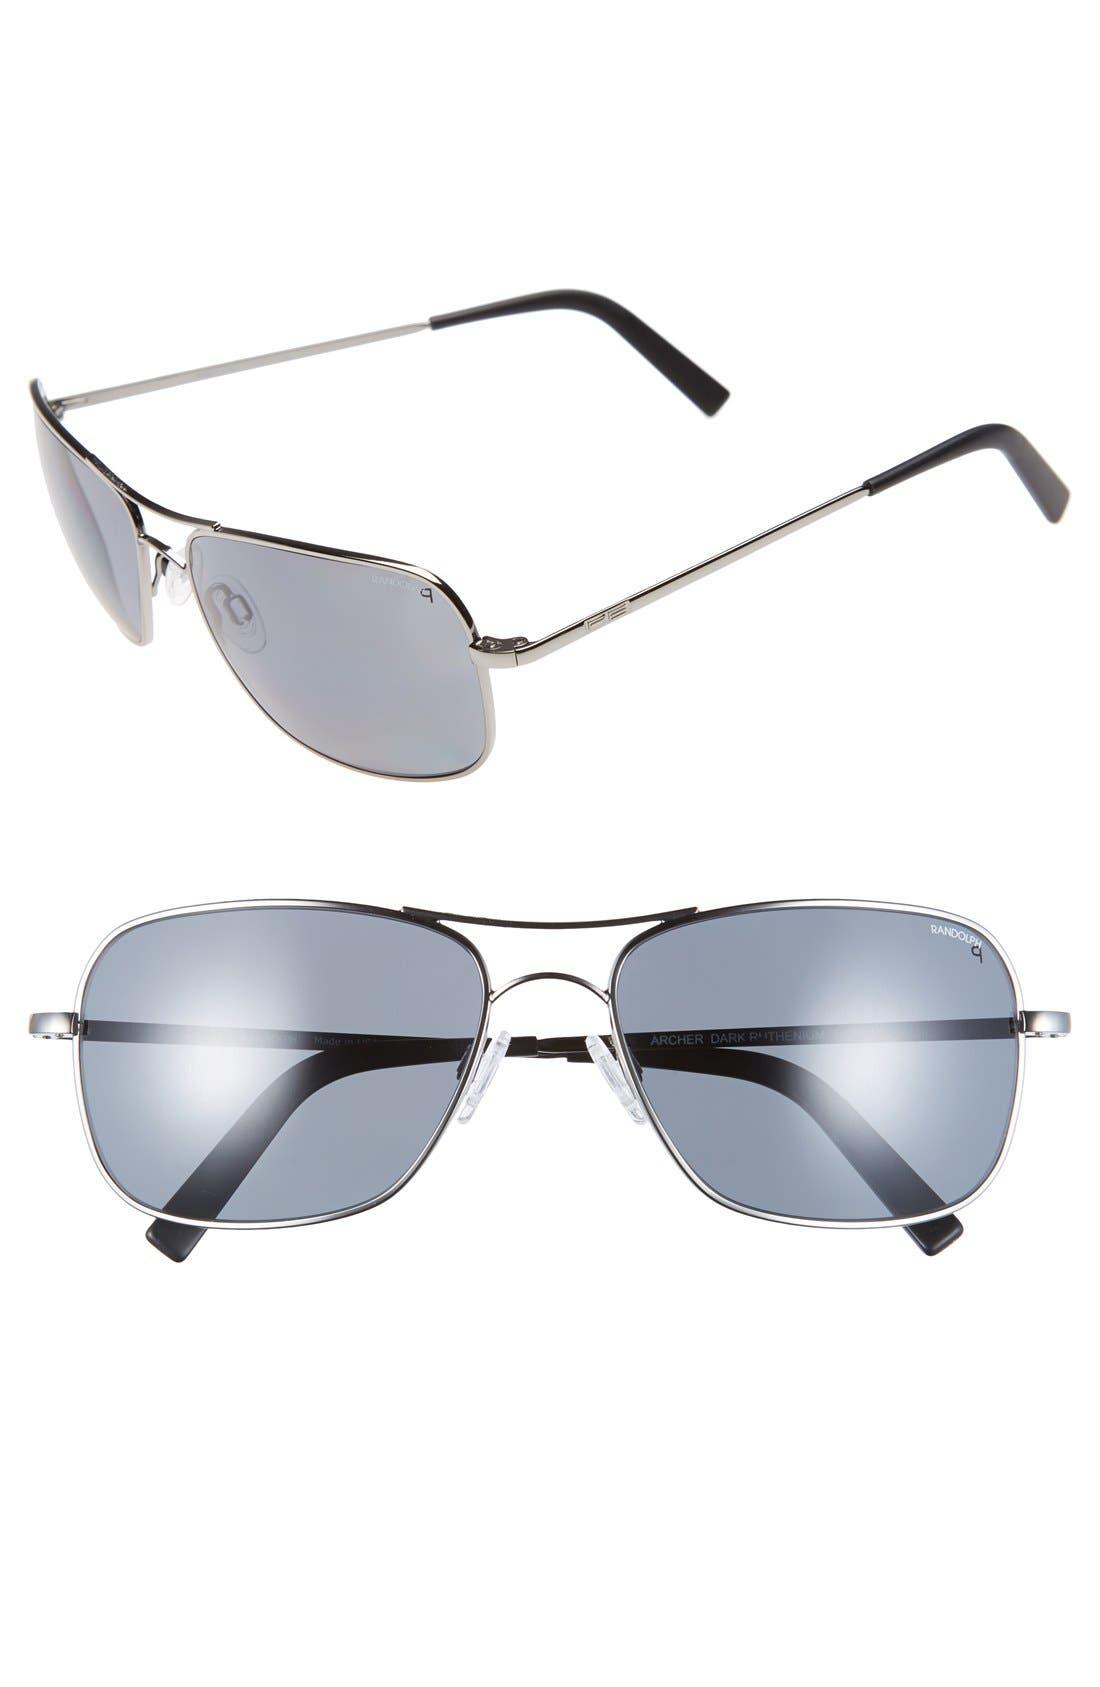 Main Image - Randolph Engineering 'Archer' 59mm Polarized Sunglasses